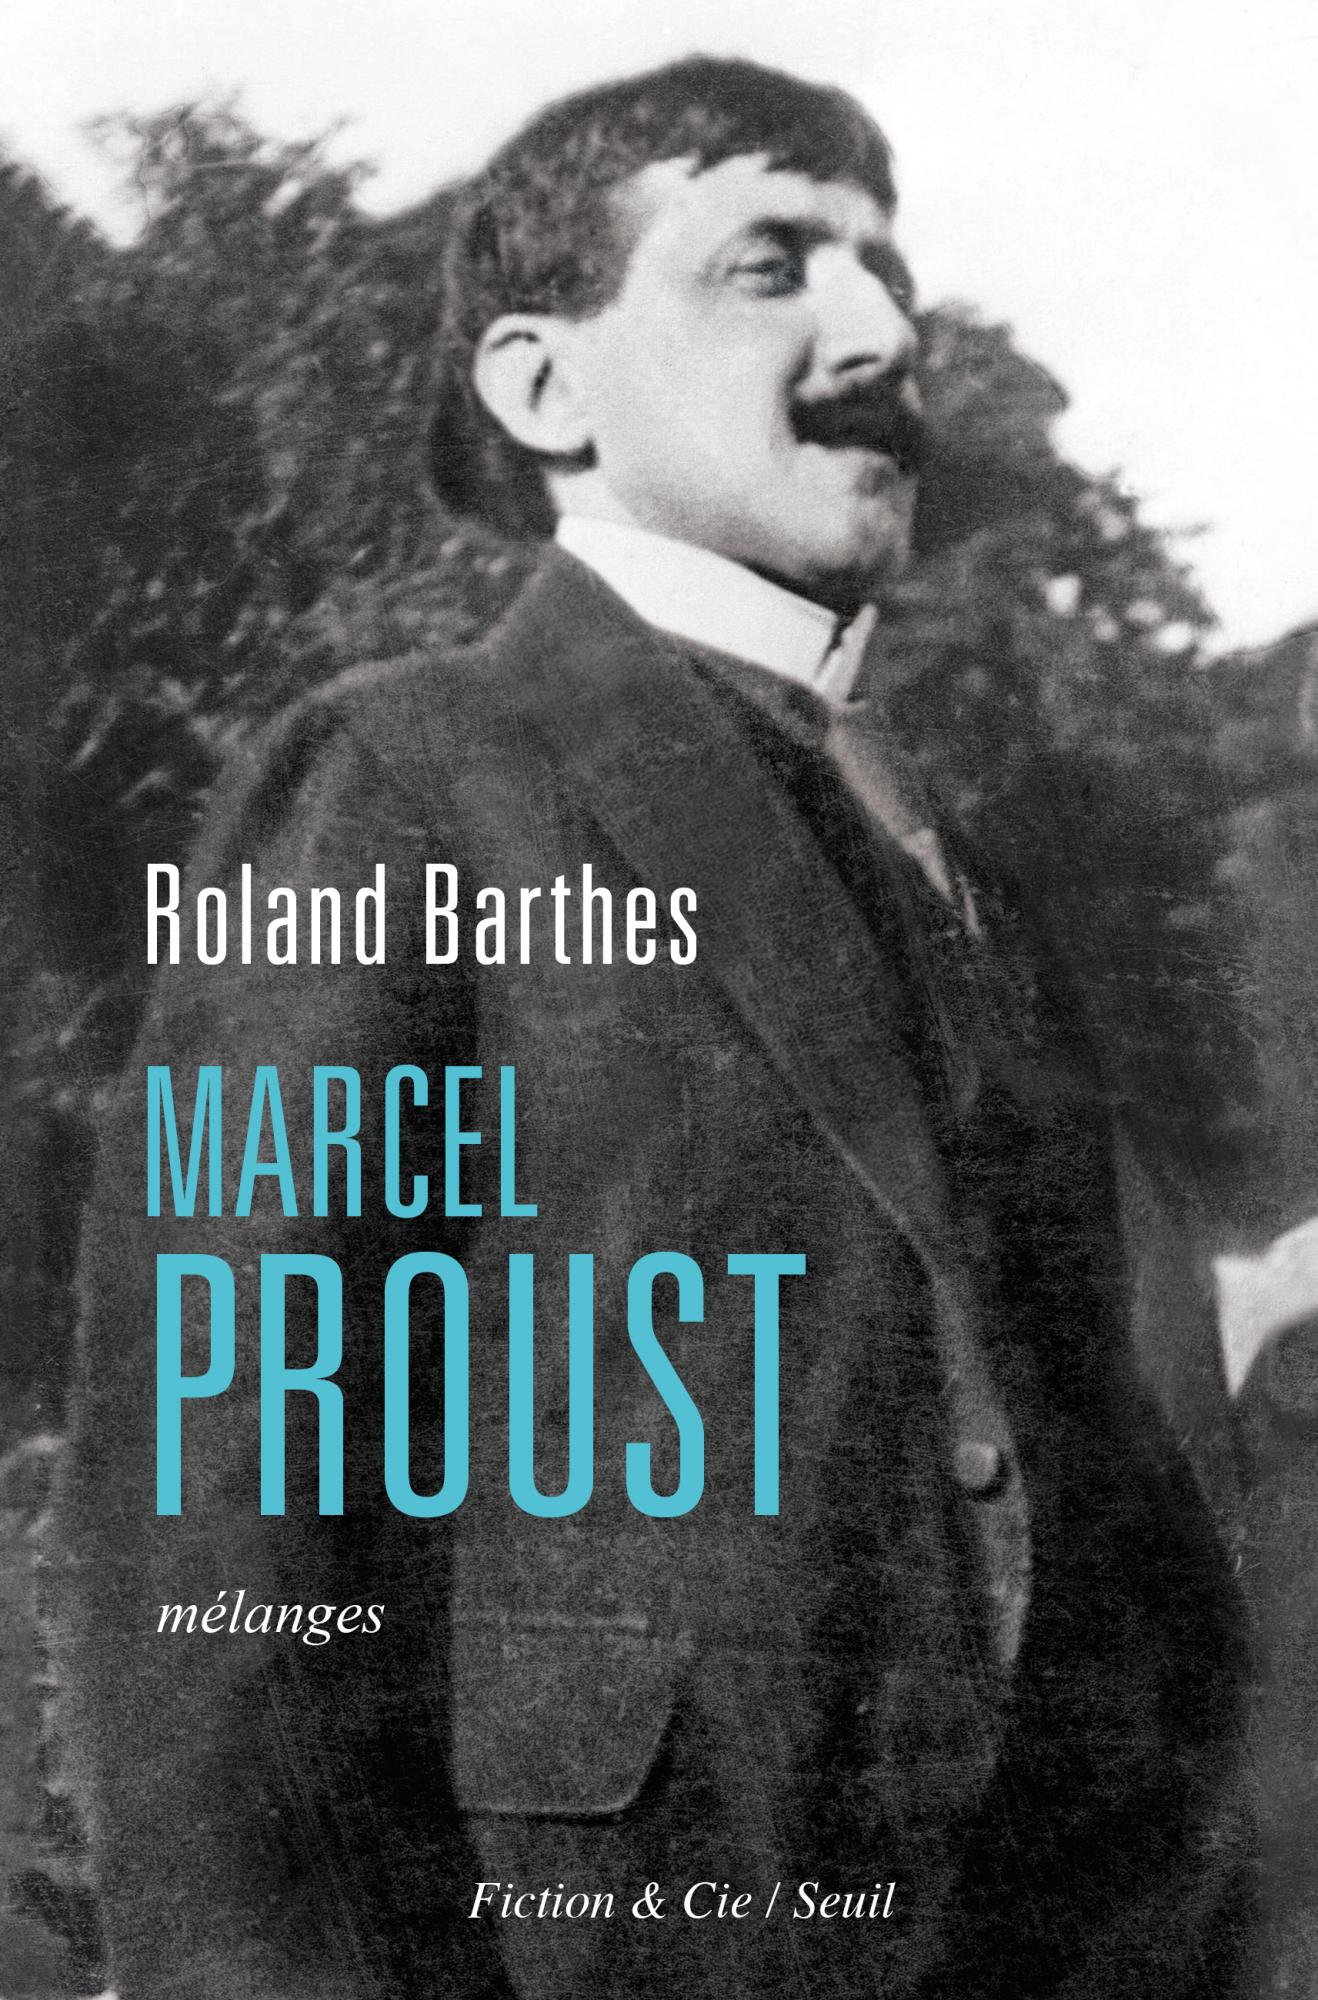 R. Barthes, Marcel Proust. Mélanges (anthologie)